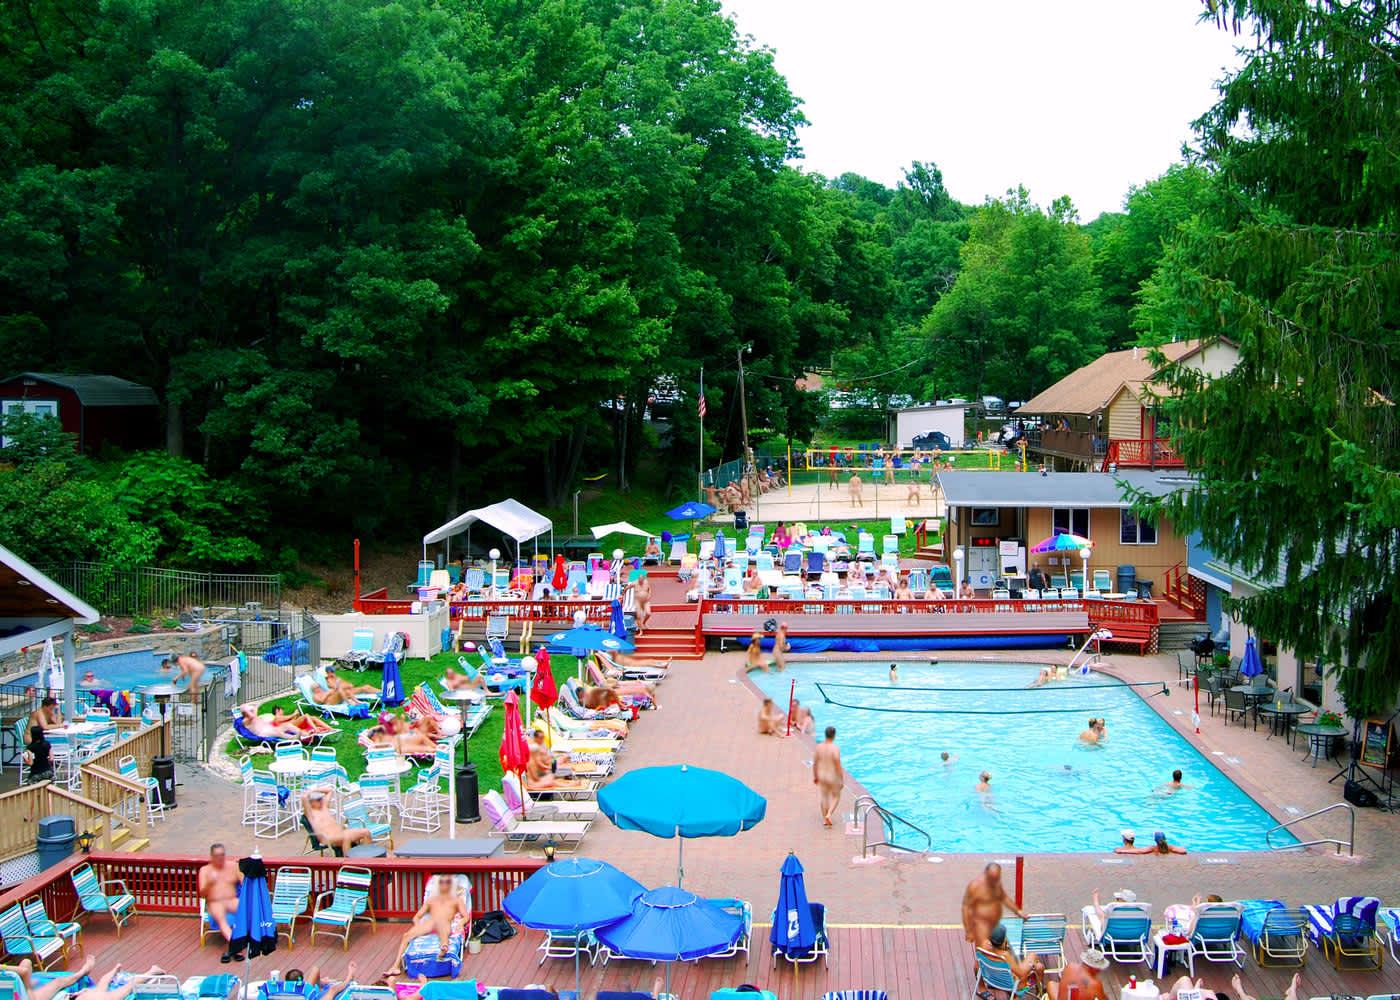 Sunny Rest Nudist Resort